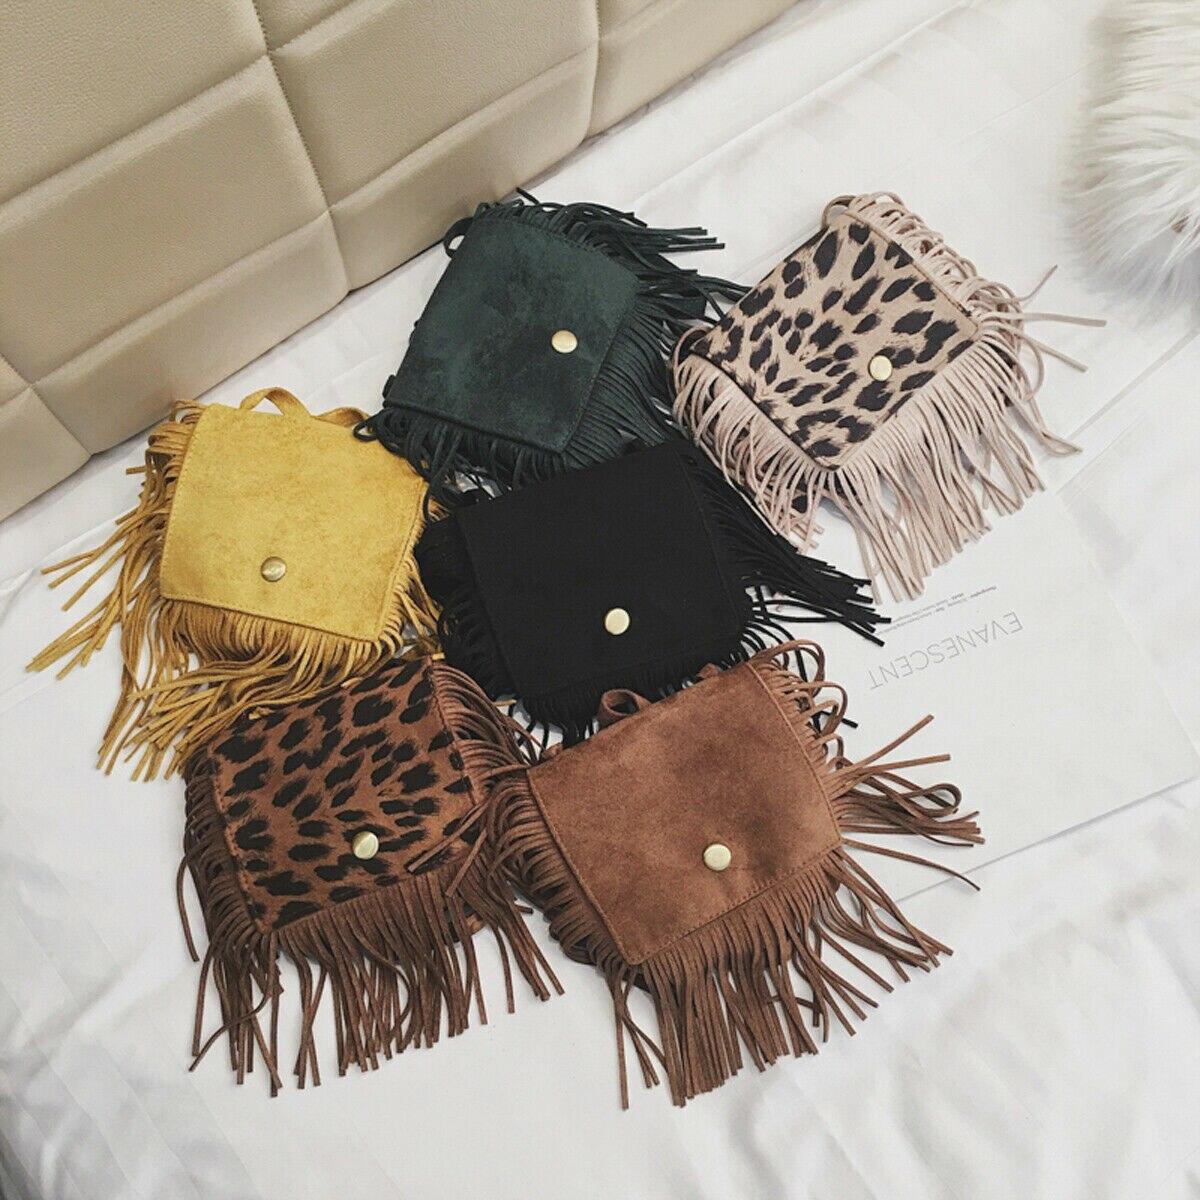 2020 Fashion Tassel Mini Messenger Bag Kids Girls Handbags Coin Purse Children Shoulder Bags Gift